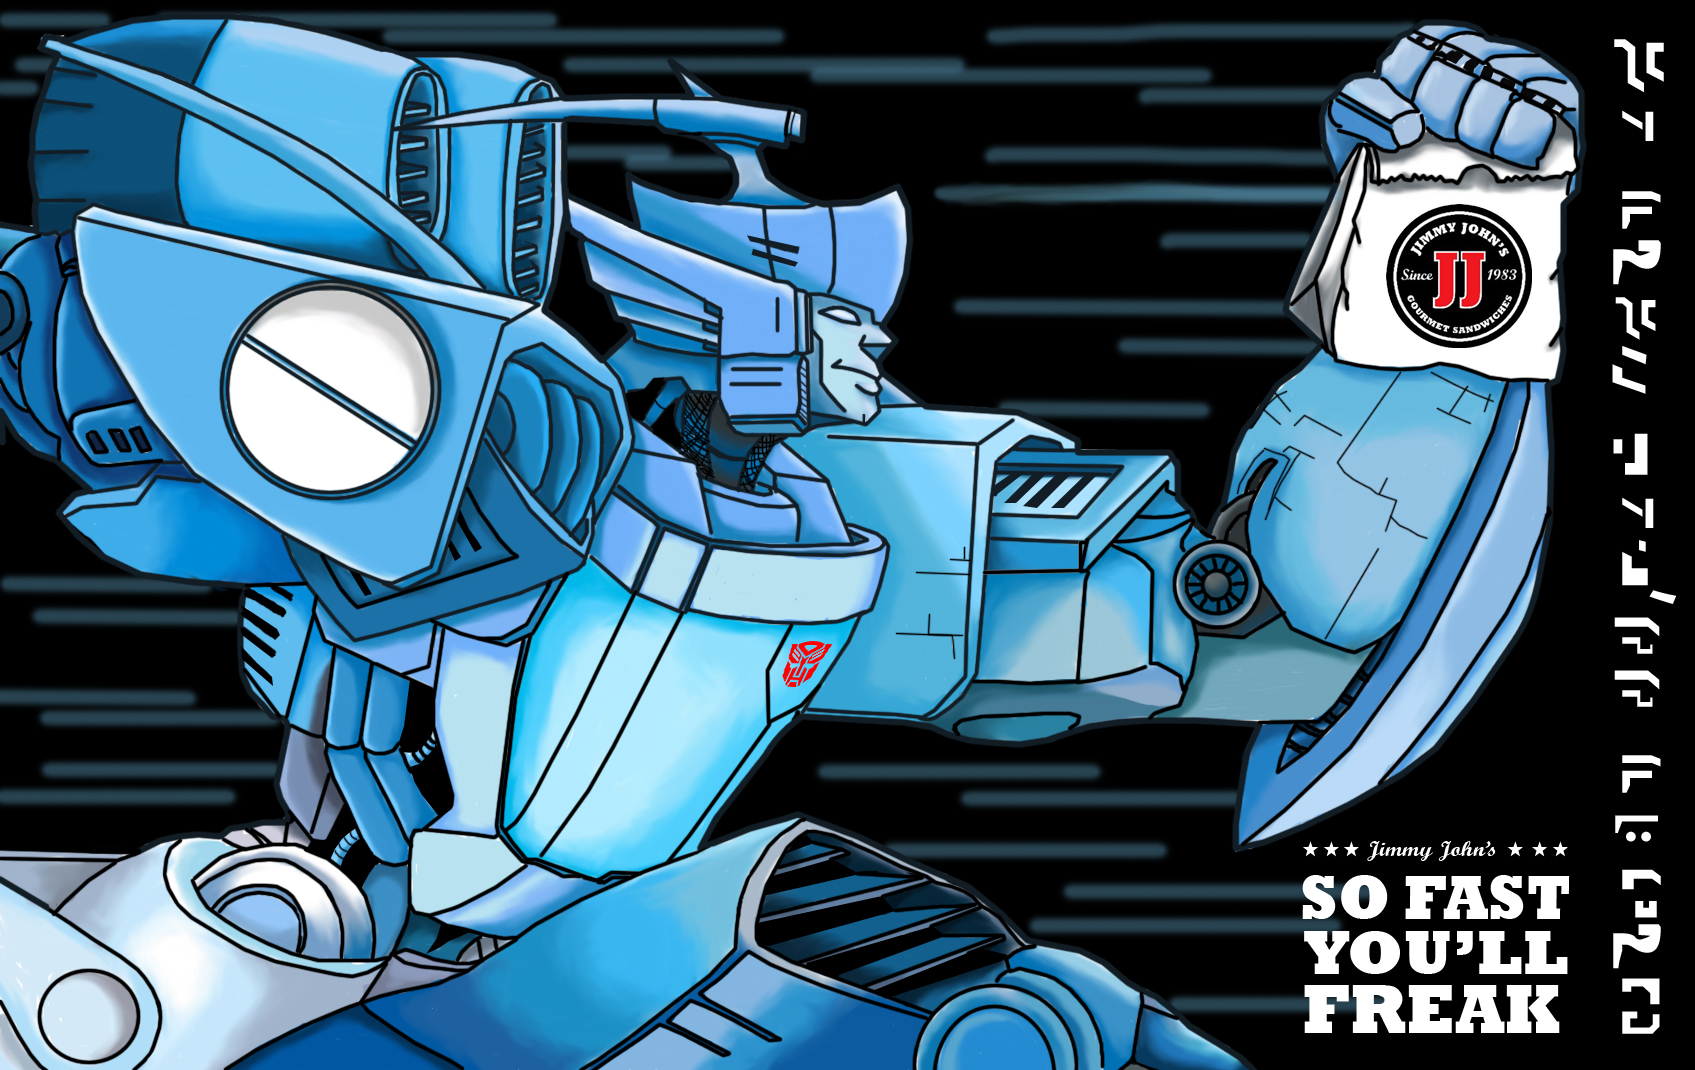 Blurr: So Fast You'll Freak v2 by skydive1588